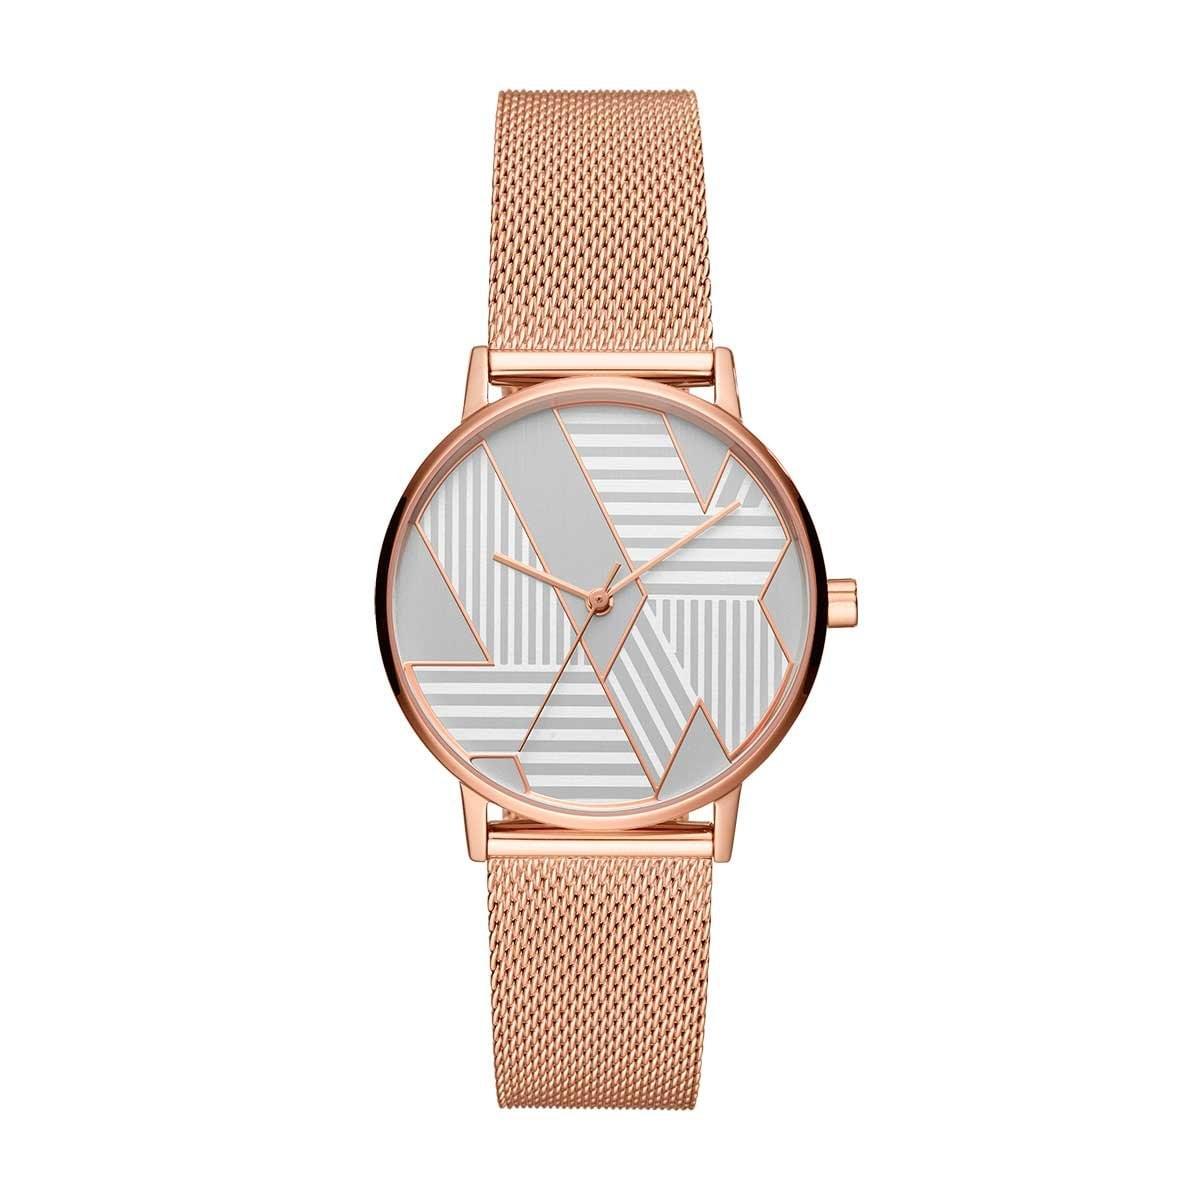 f0b3310e19d0 Reloj dama armani exchange ax5550